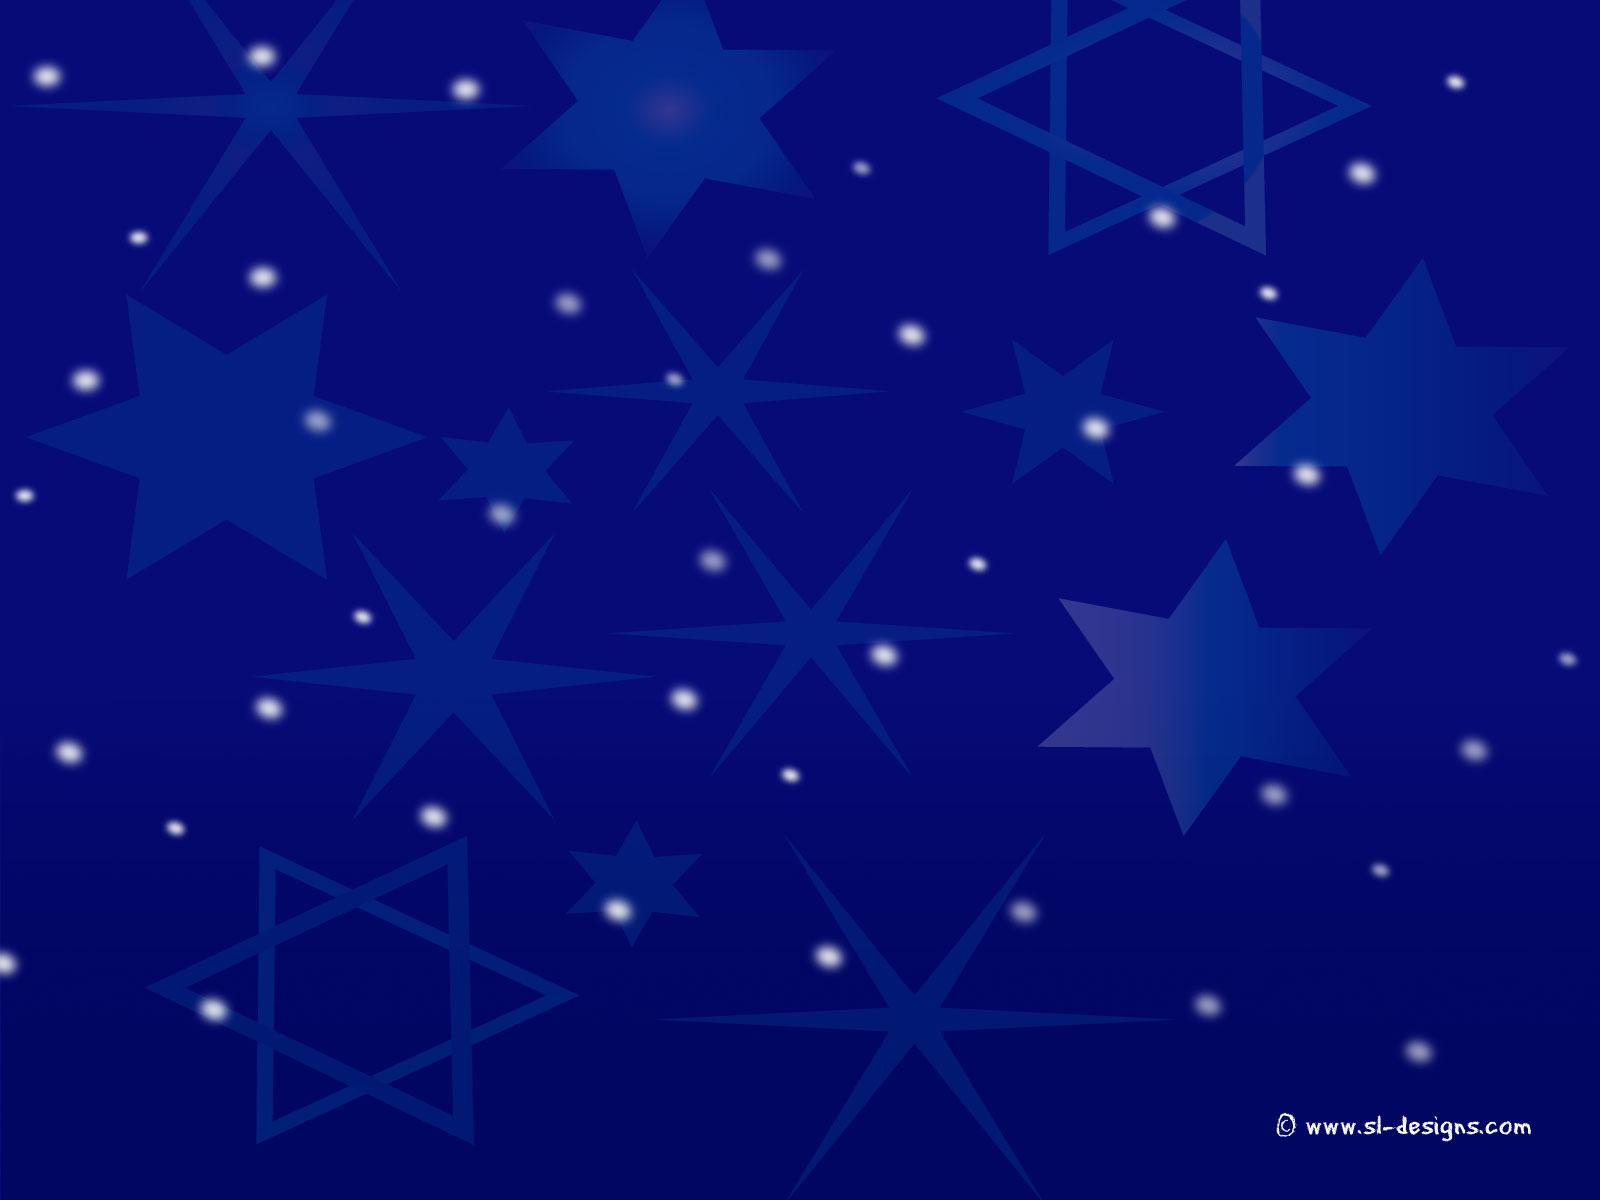 Hanukkah Wallpapers HD Wallpapers Download Free Images Wallpaper [1000image.com]